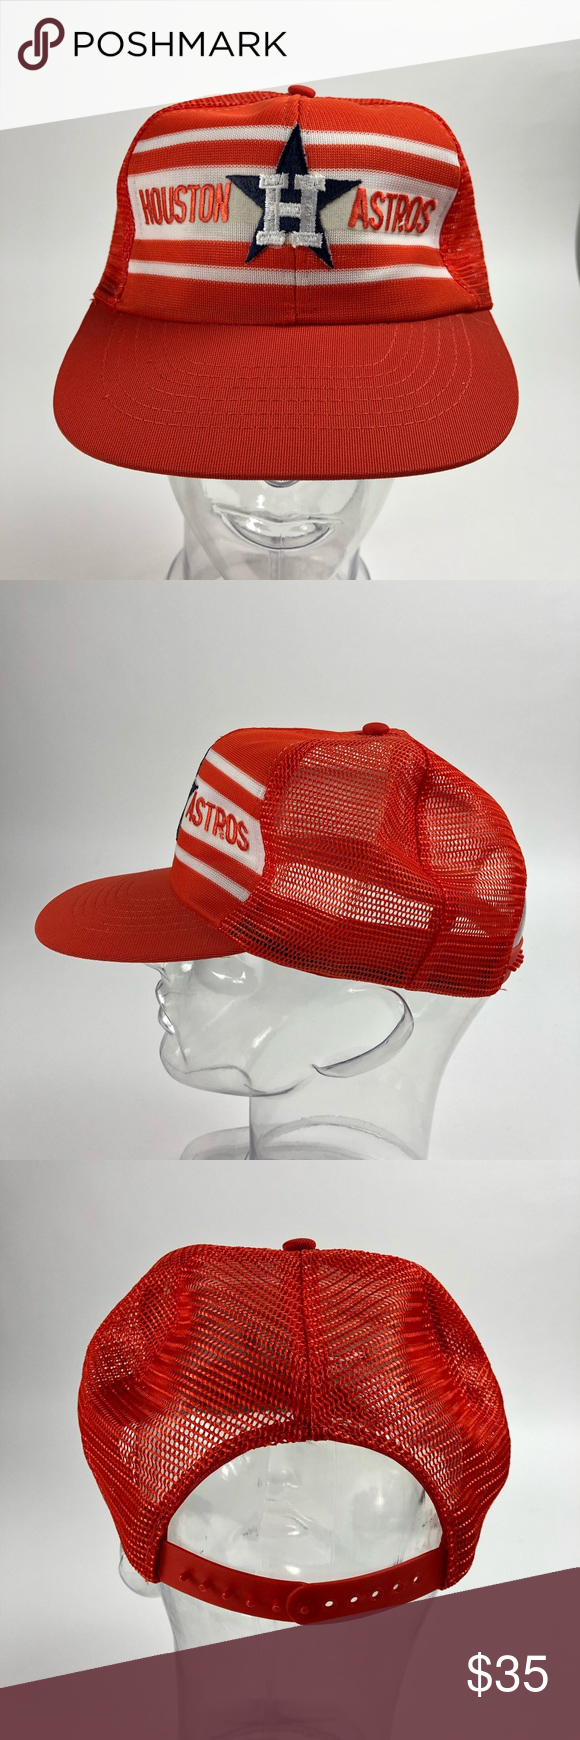 df089aa4 Houston Astros Vintage Deadstock Snapback Hat Houston Astros Official MLB  80's mesh adjustable snapback hat.